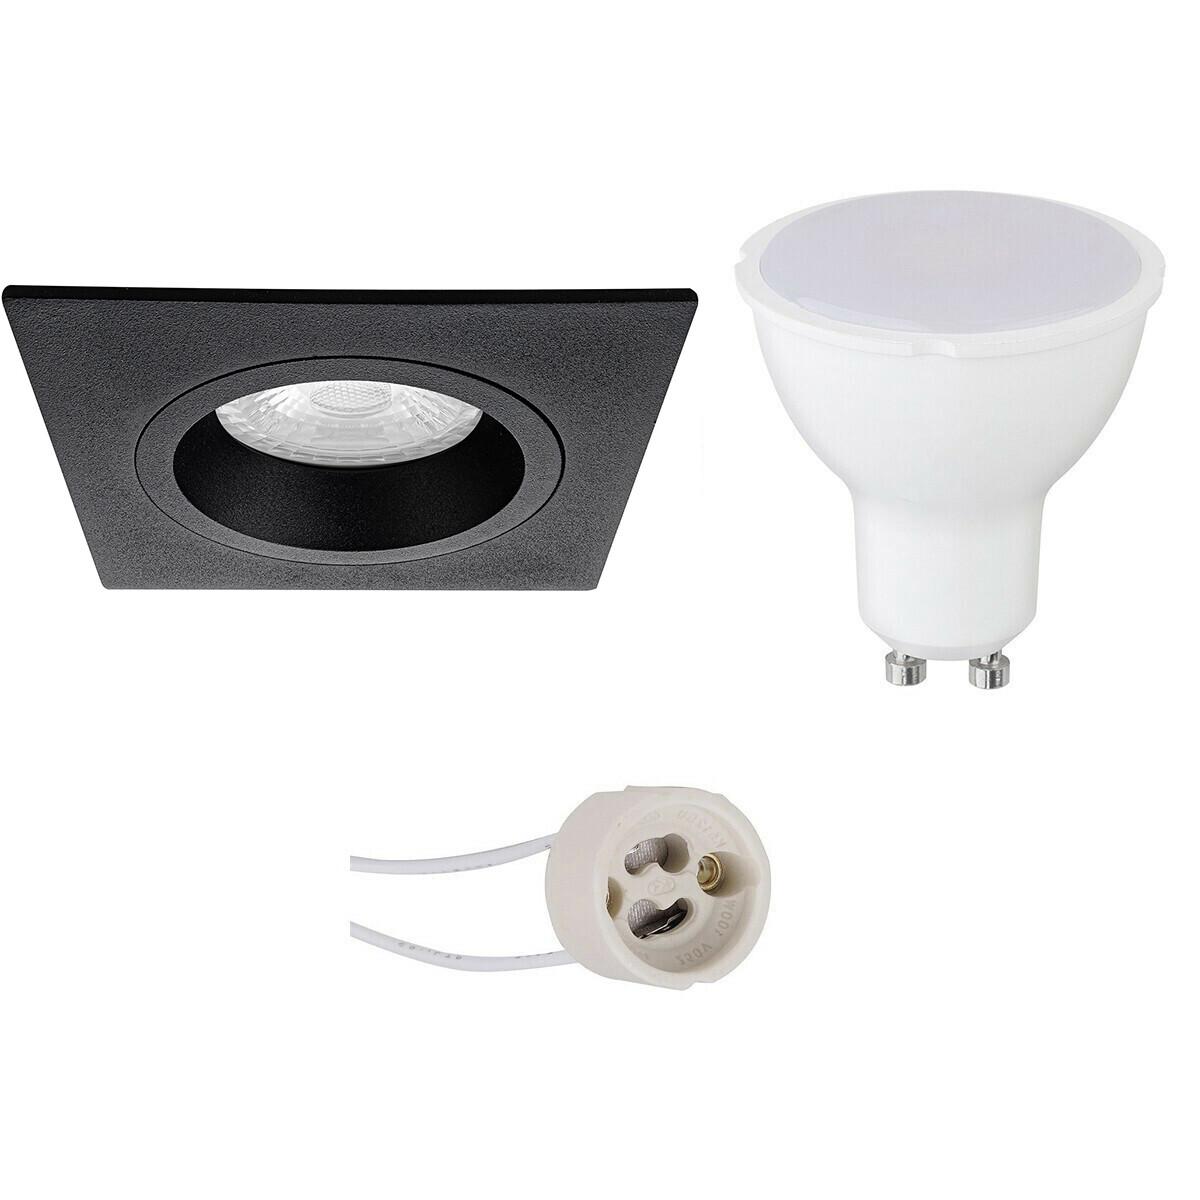 LED Spot Set - Pragmi Rodos Pro - GU10 Fitting - Inbouw Vierkant - Mat Zwart - 4W - Natuurlijk Wit 4